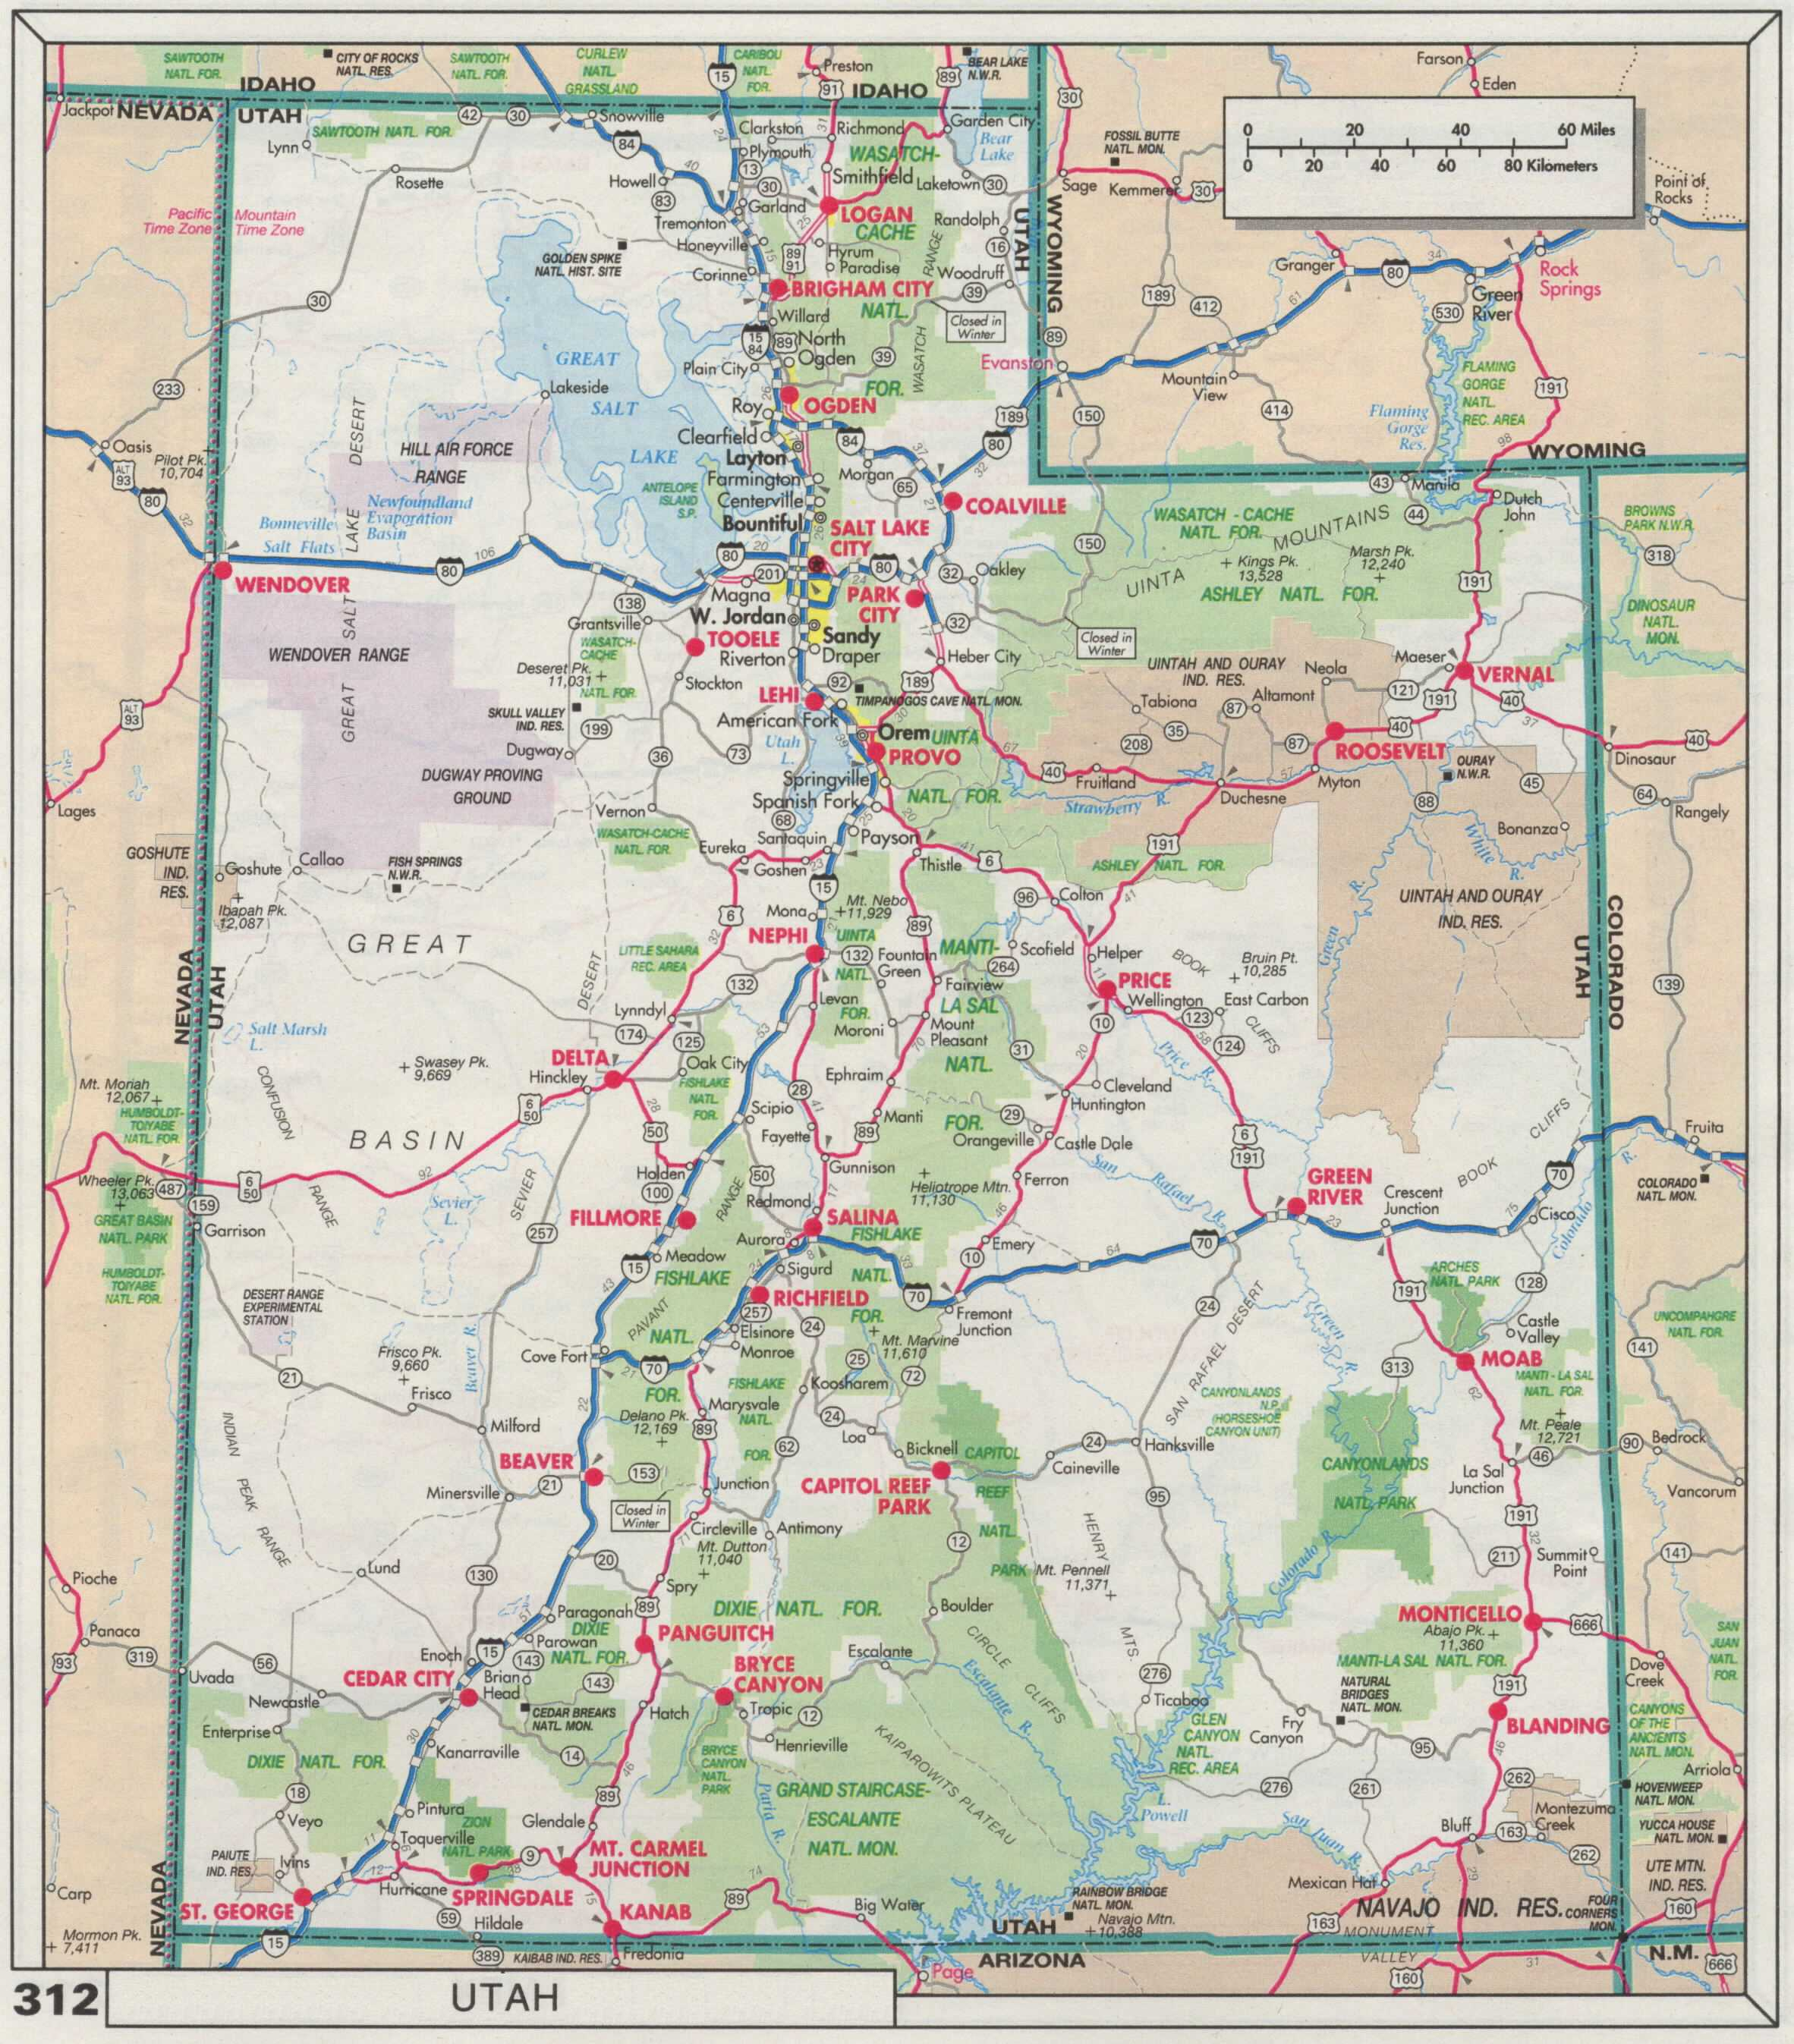 The Web Shell - Utah road map